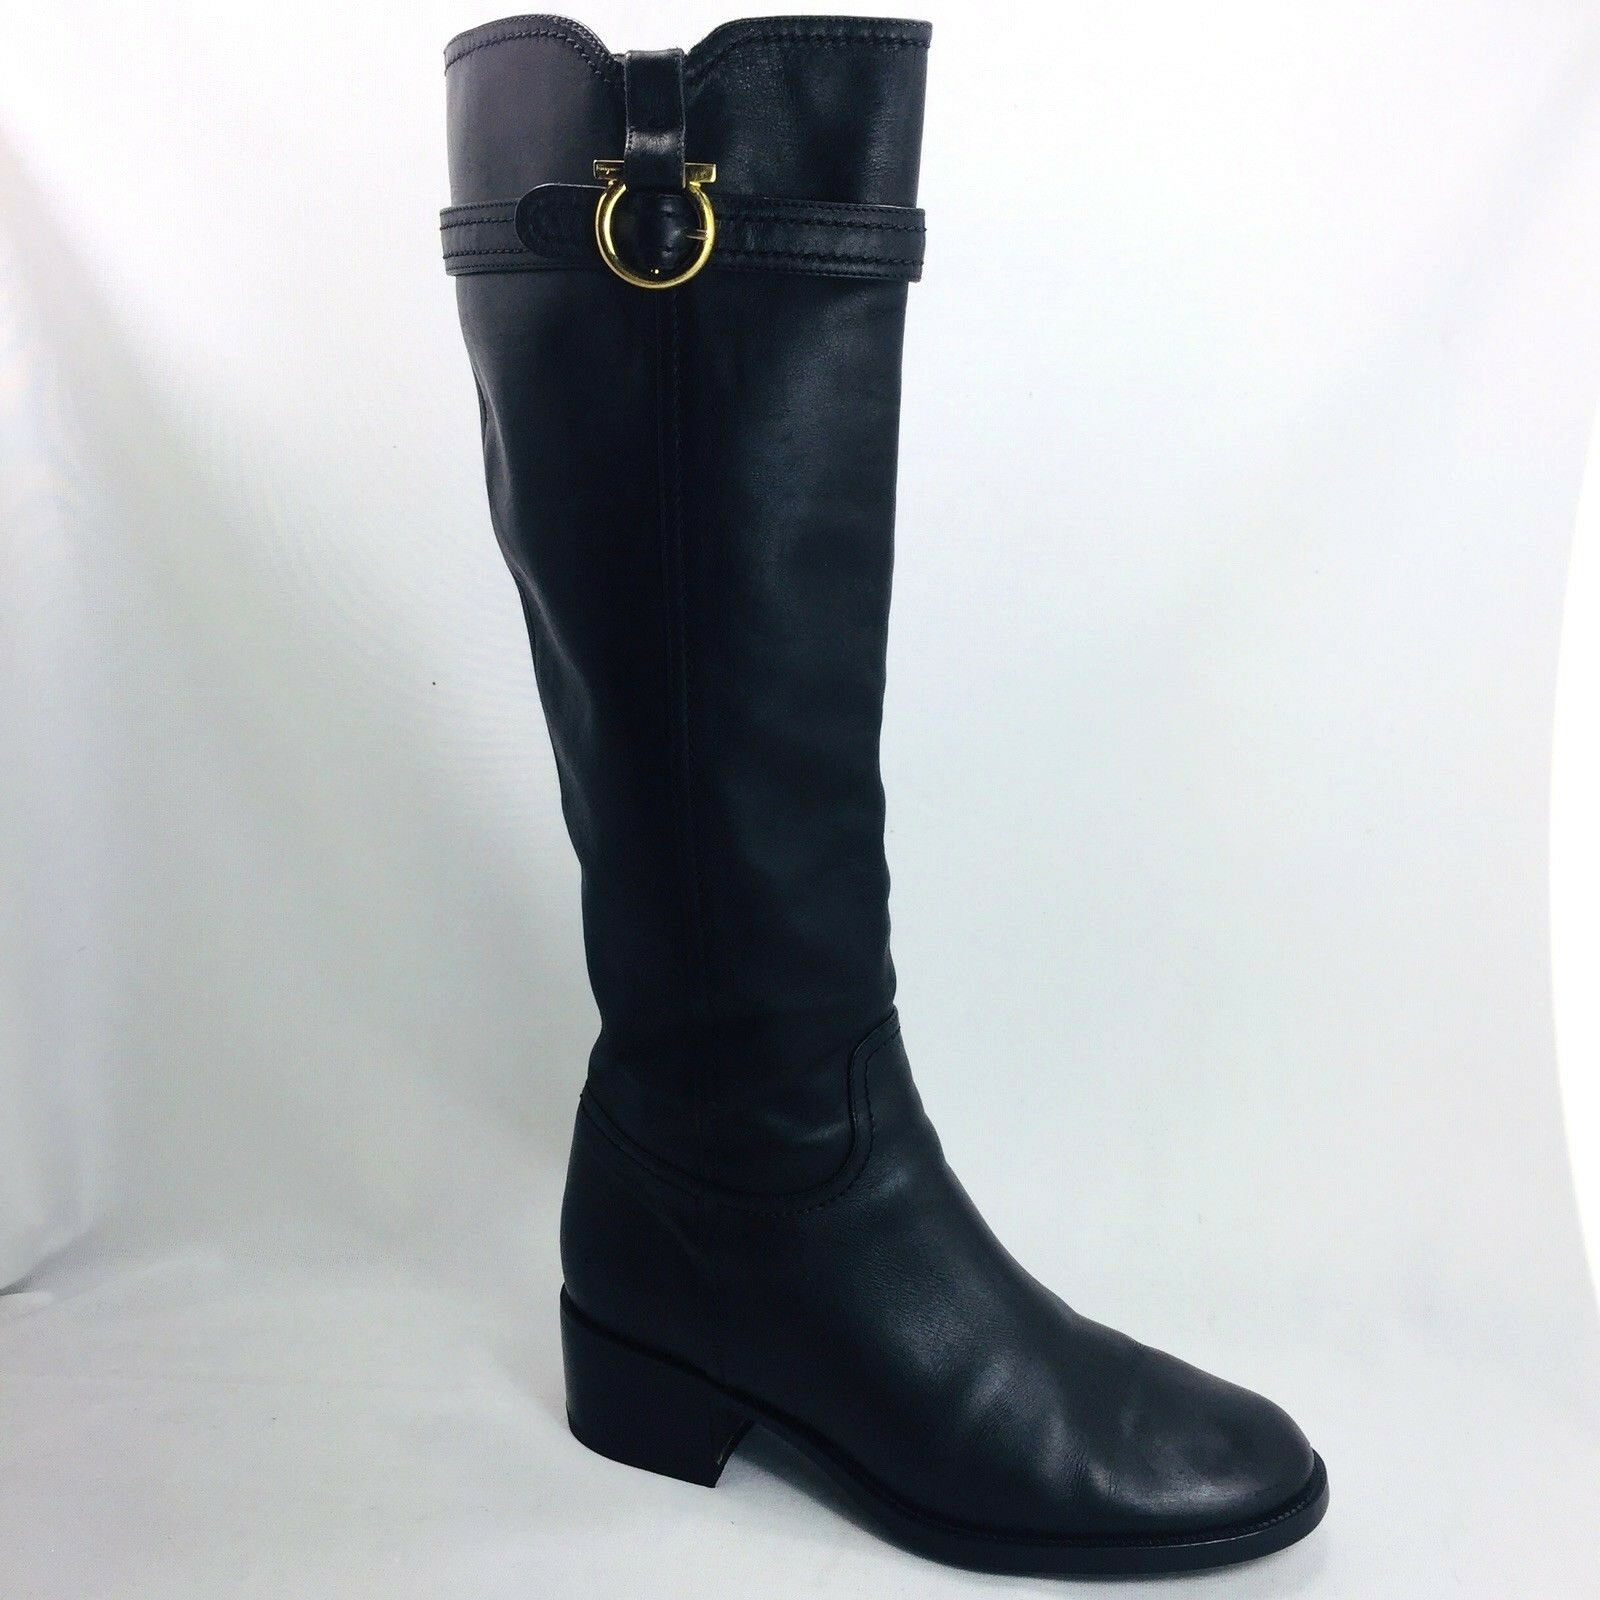 Salvatore Ferragamo Robespierre Gancini Black Leather Tall Riding Boots Size 9.5